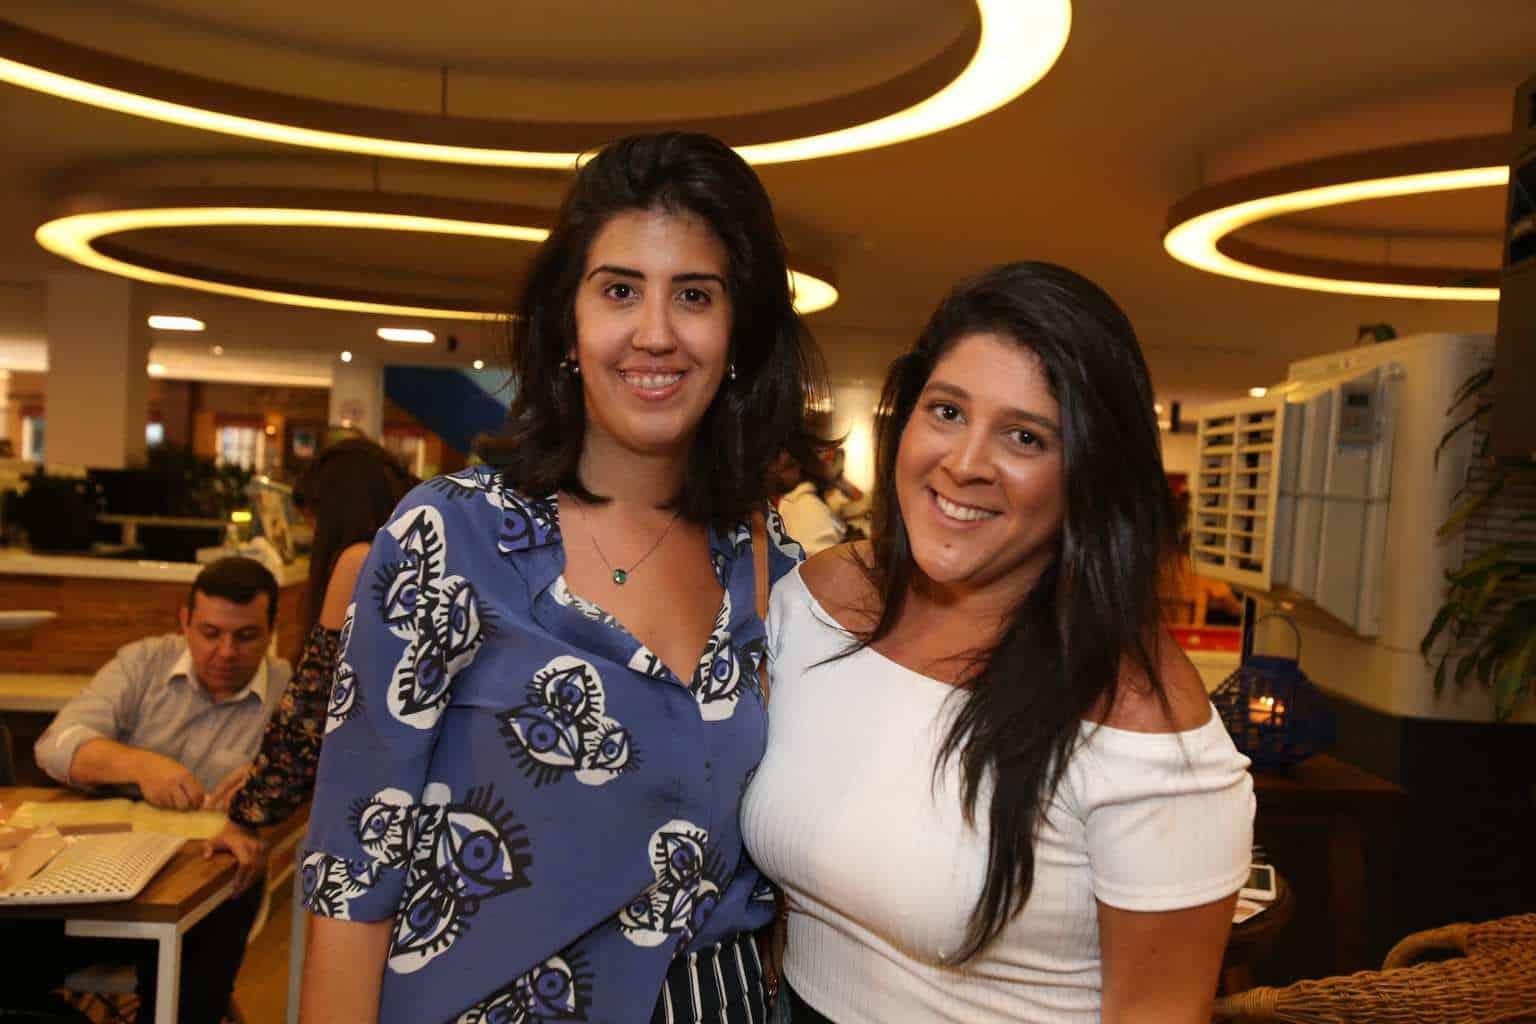 Joana-Latini-e-Clara-Nobrega_-Gabriel-Mendes-1